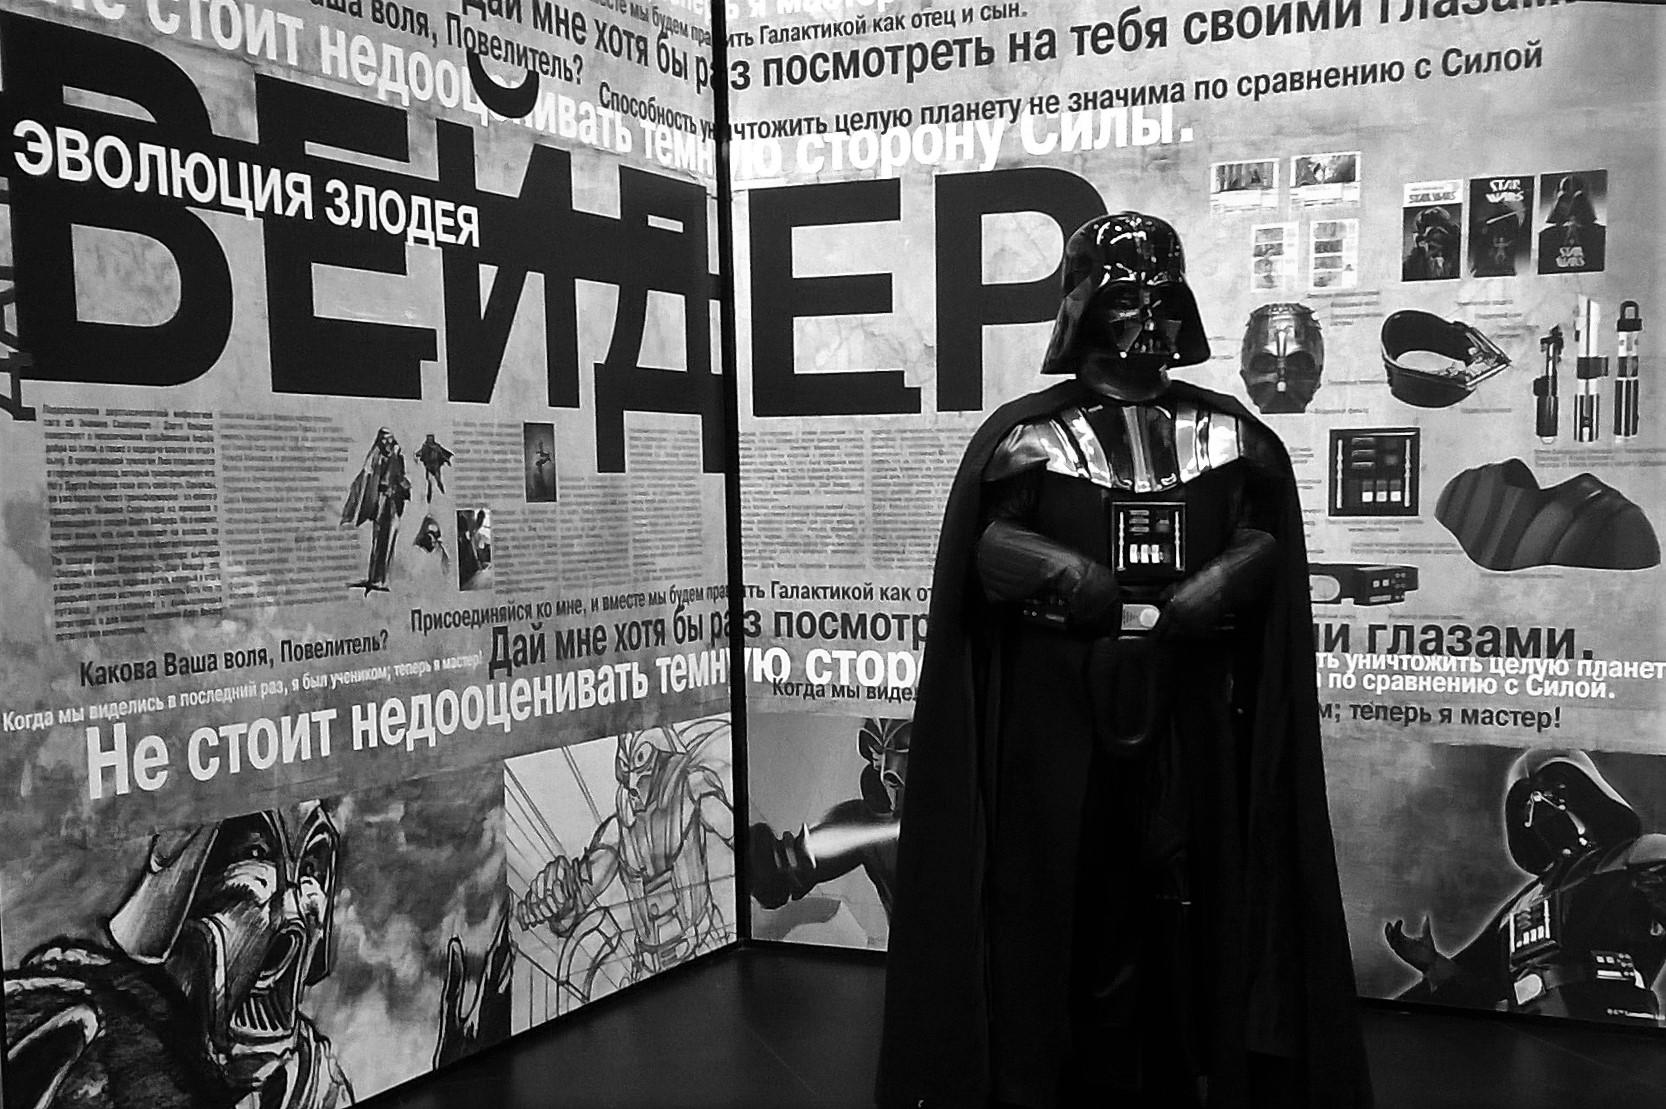 https://www.kinonews.ru/stuff/fe6c8447e7eff0c.jpg